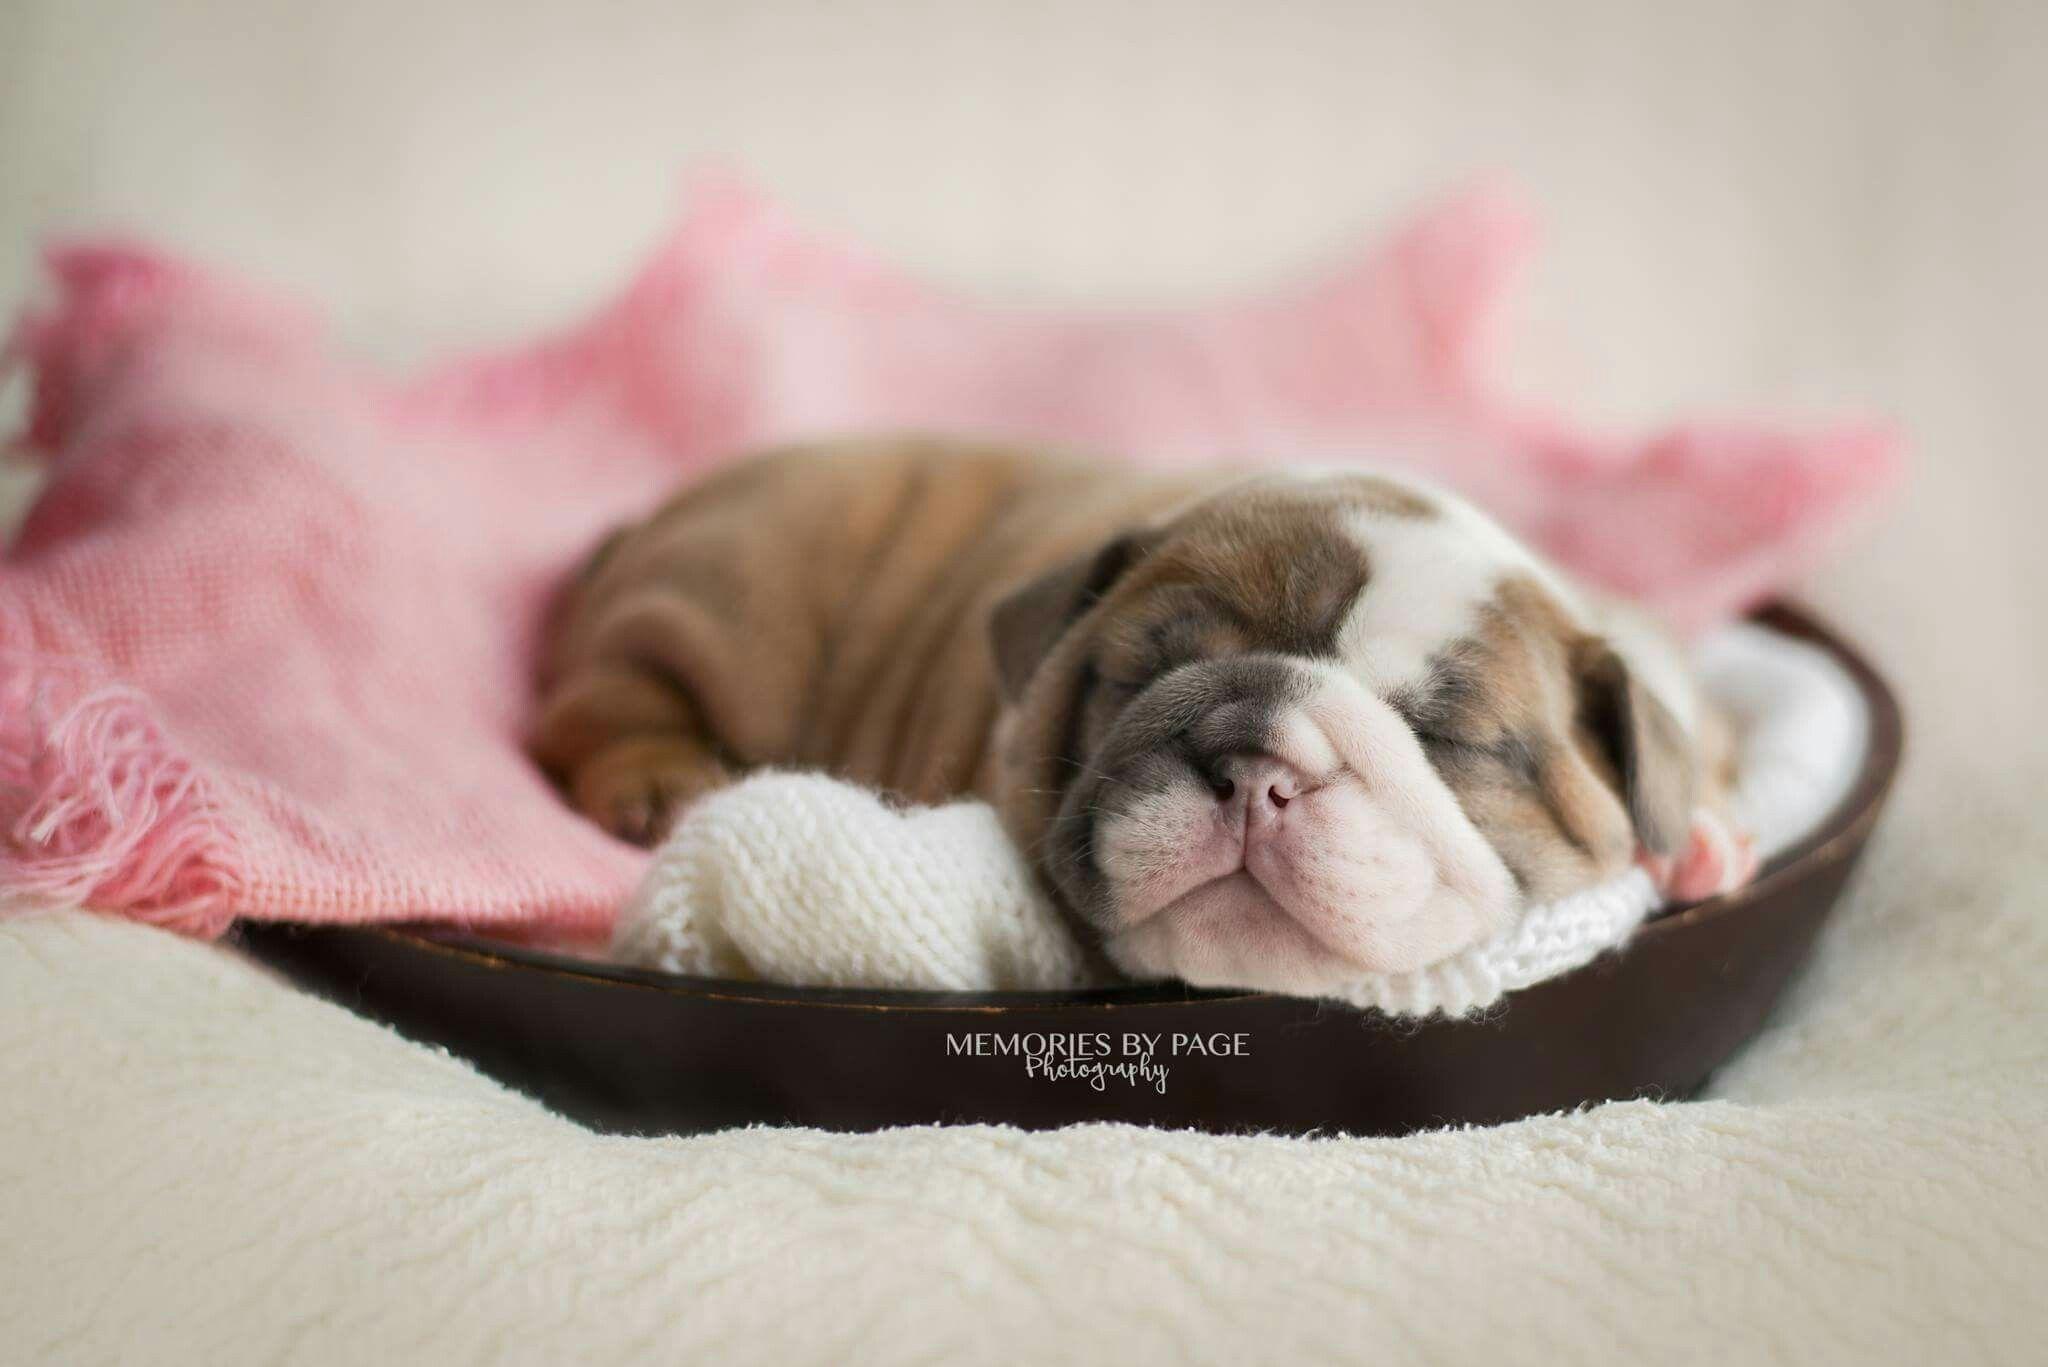 Newborn Bulldog Puppies Http Ift Tt 2p9ayoc Newborn Puppies